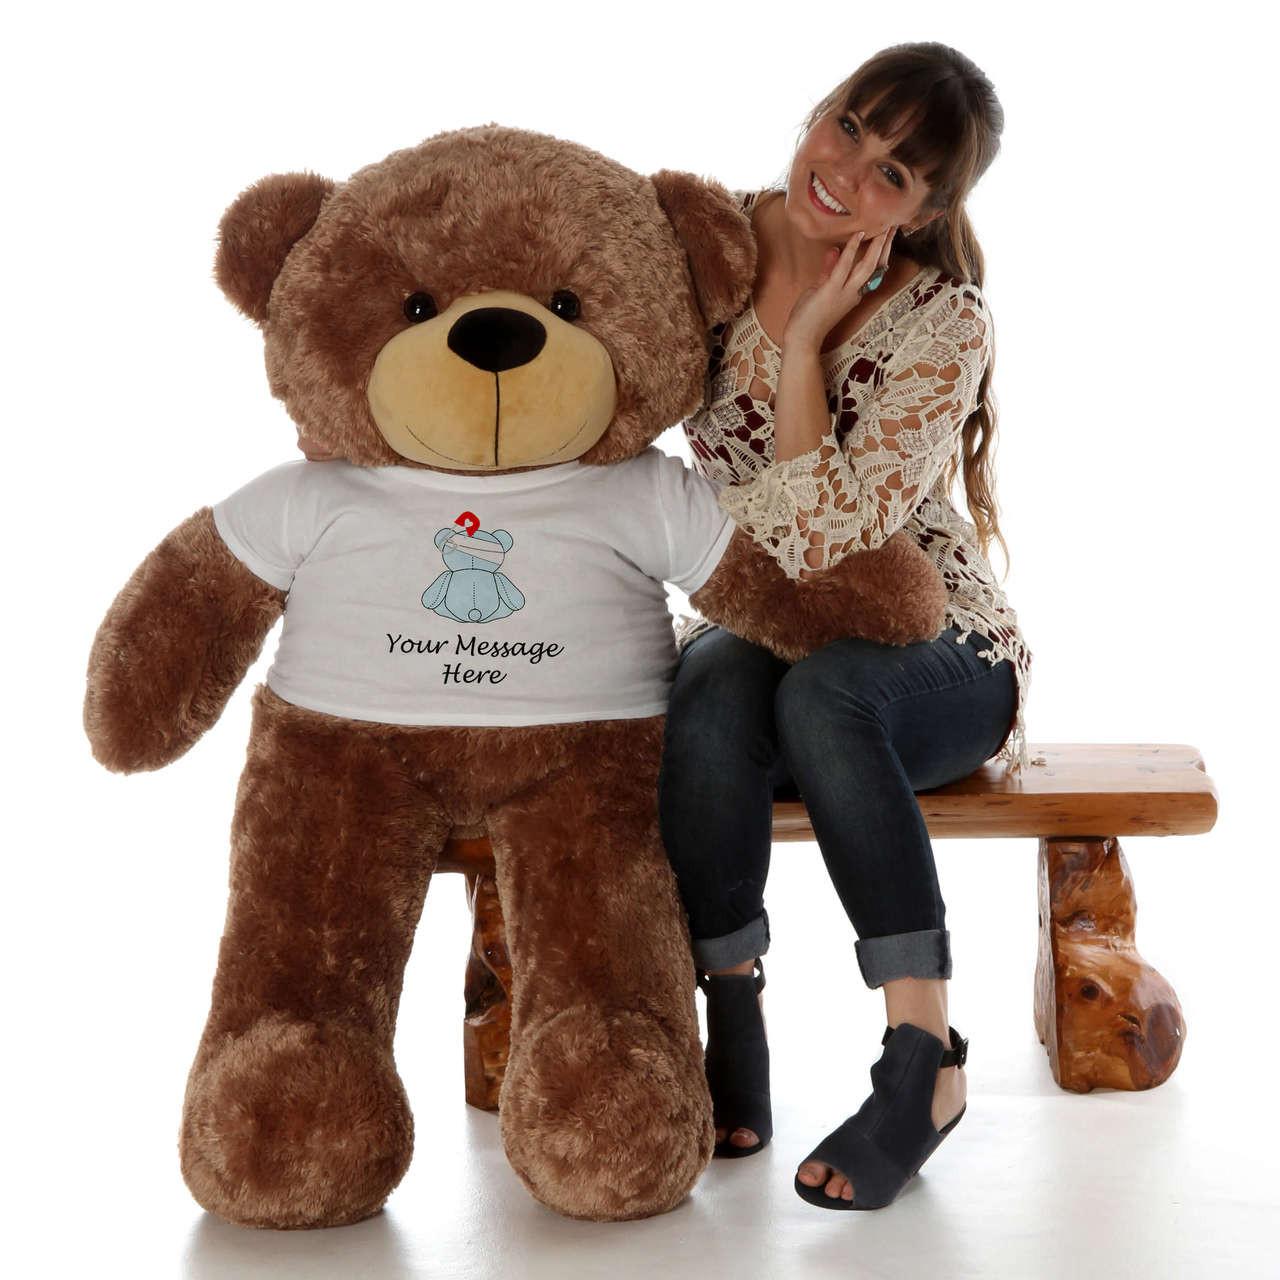 48in Mocha Sunny Cuddles in personalized blue teddy bear in bandage shirt